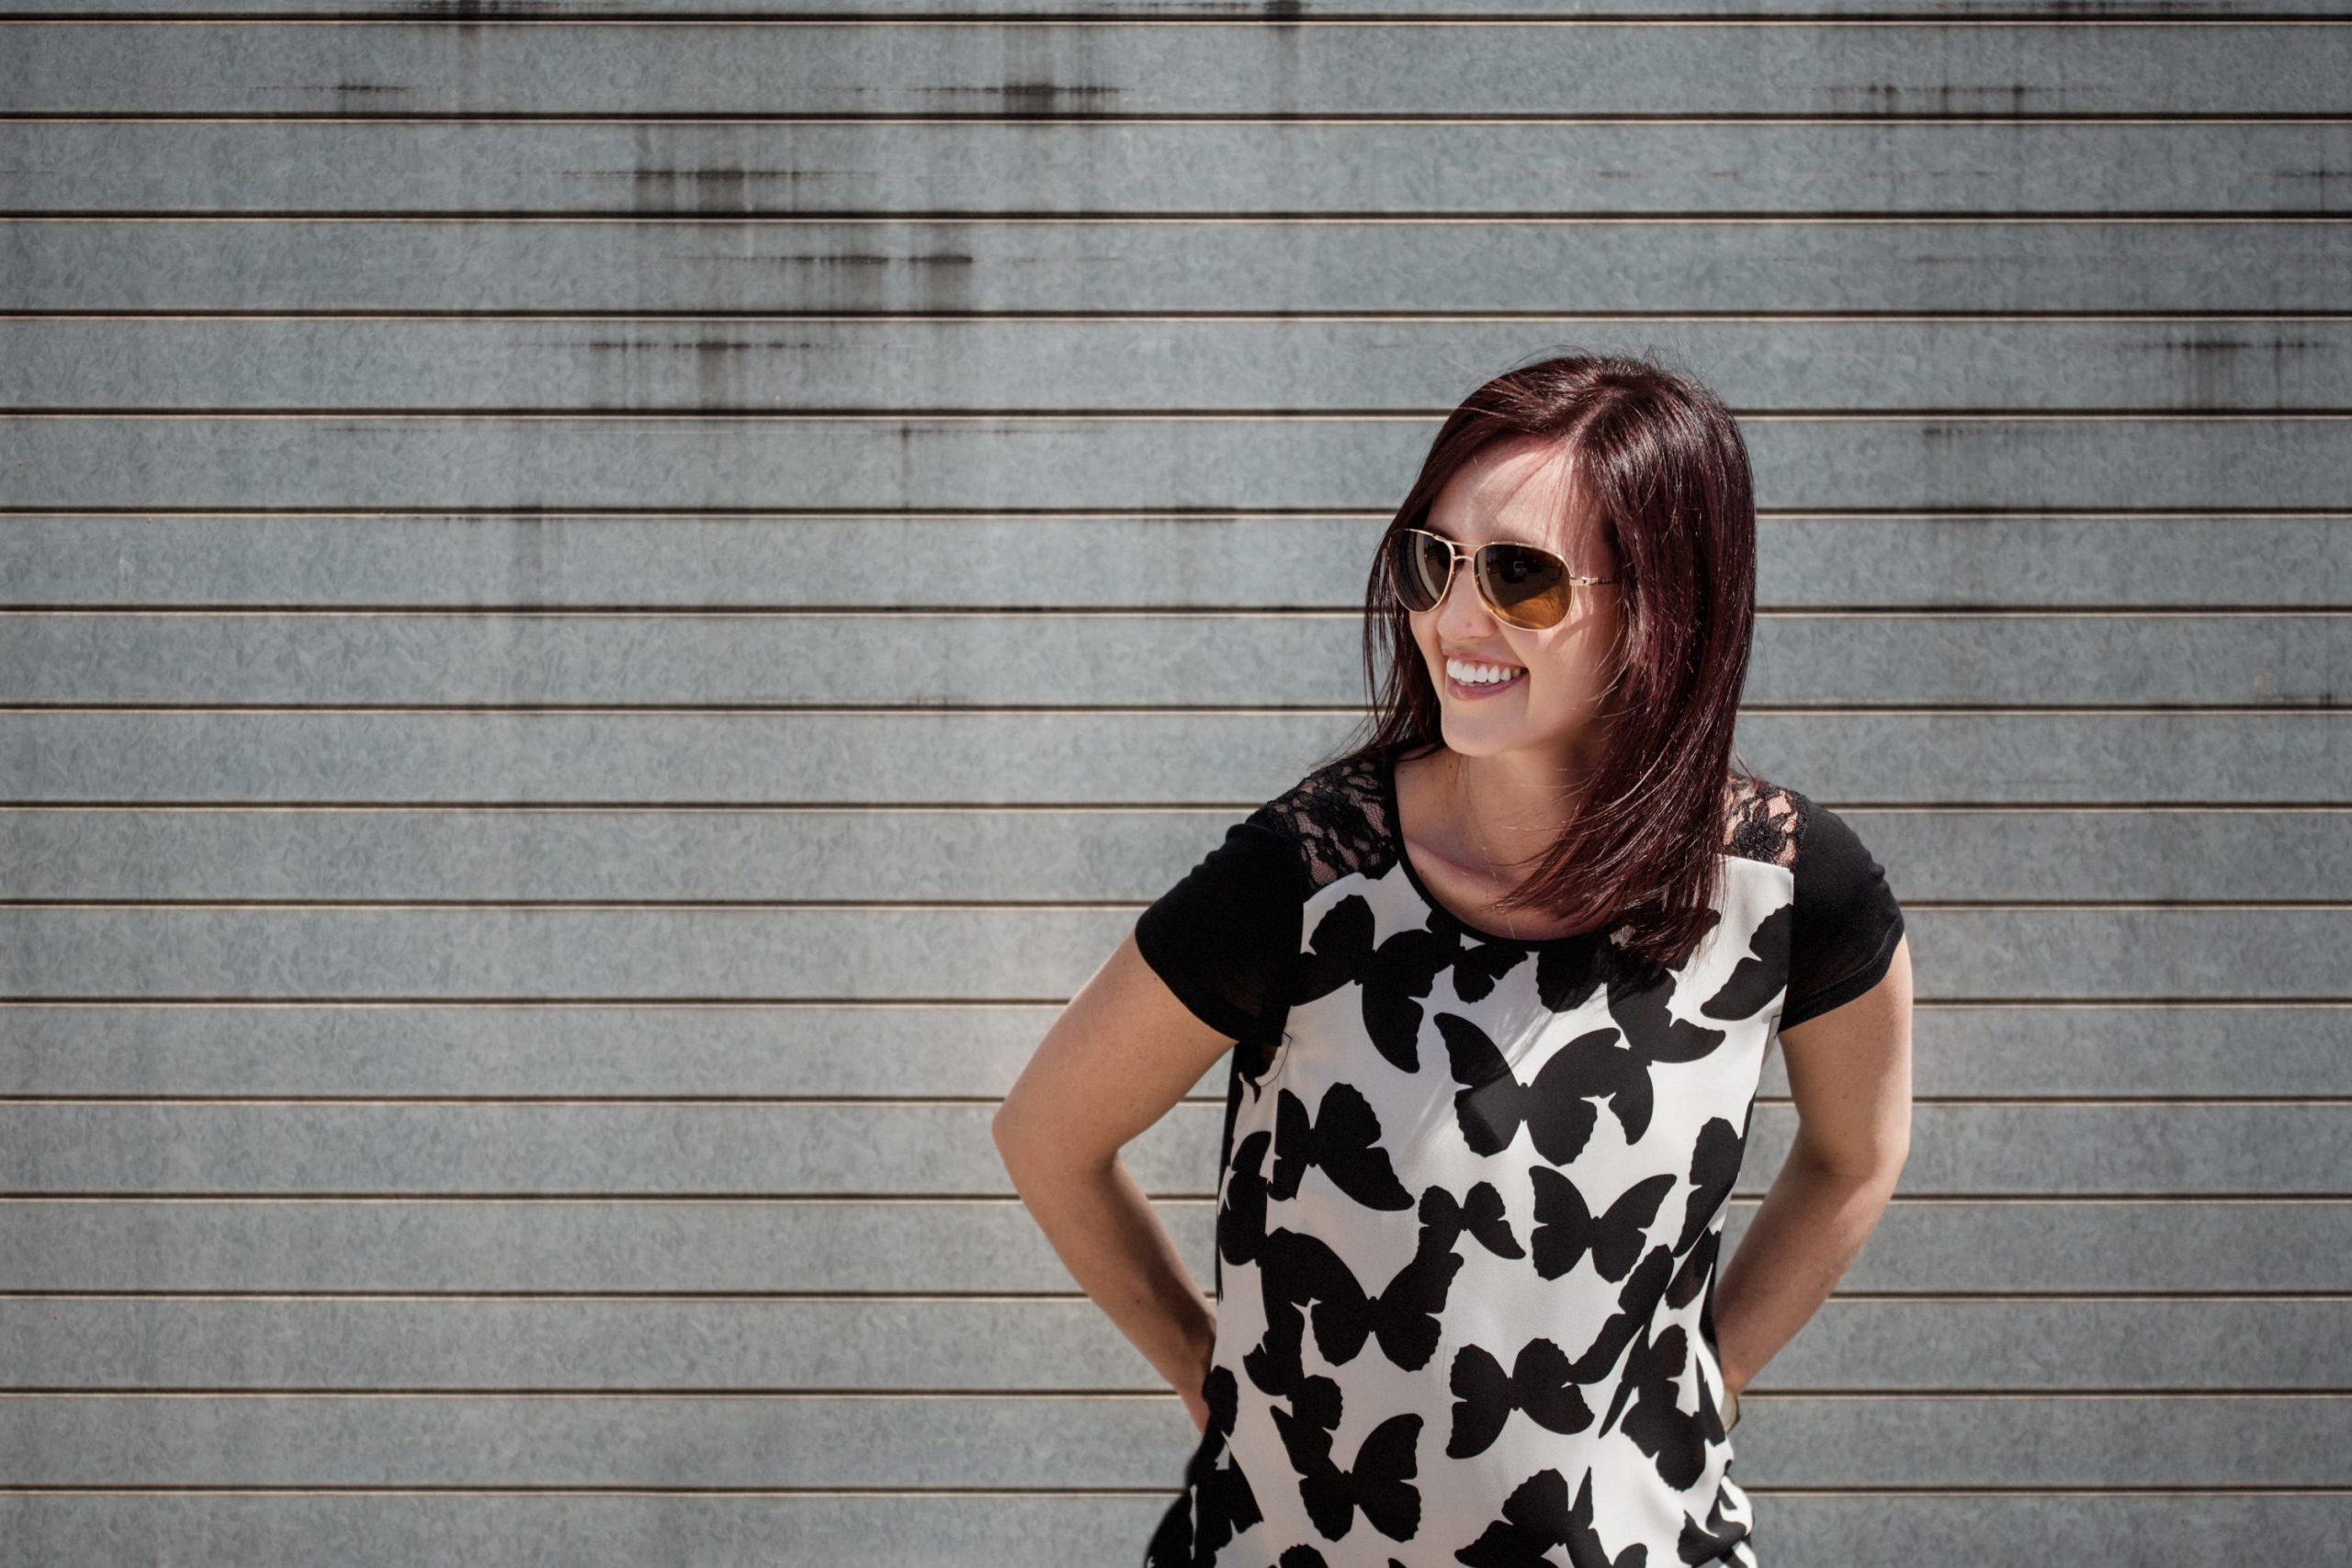 Kamloops headshot photographer for entrepreneurs and business women